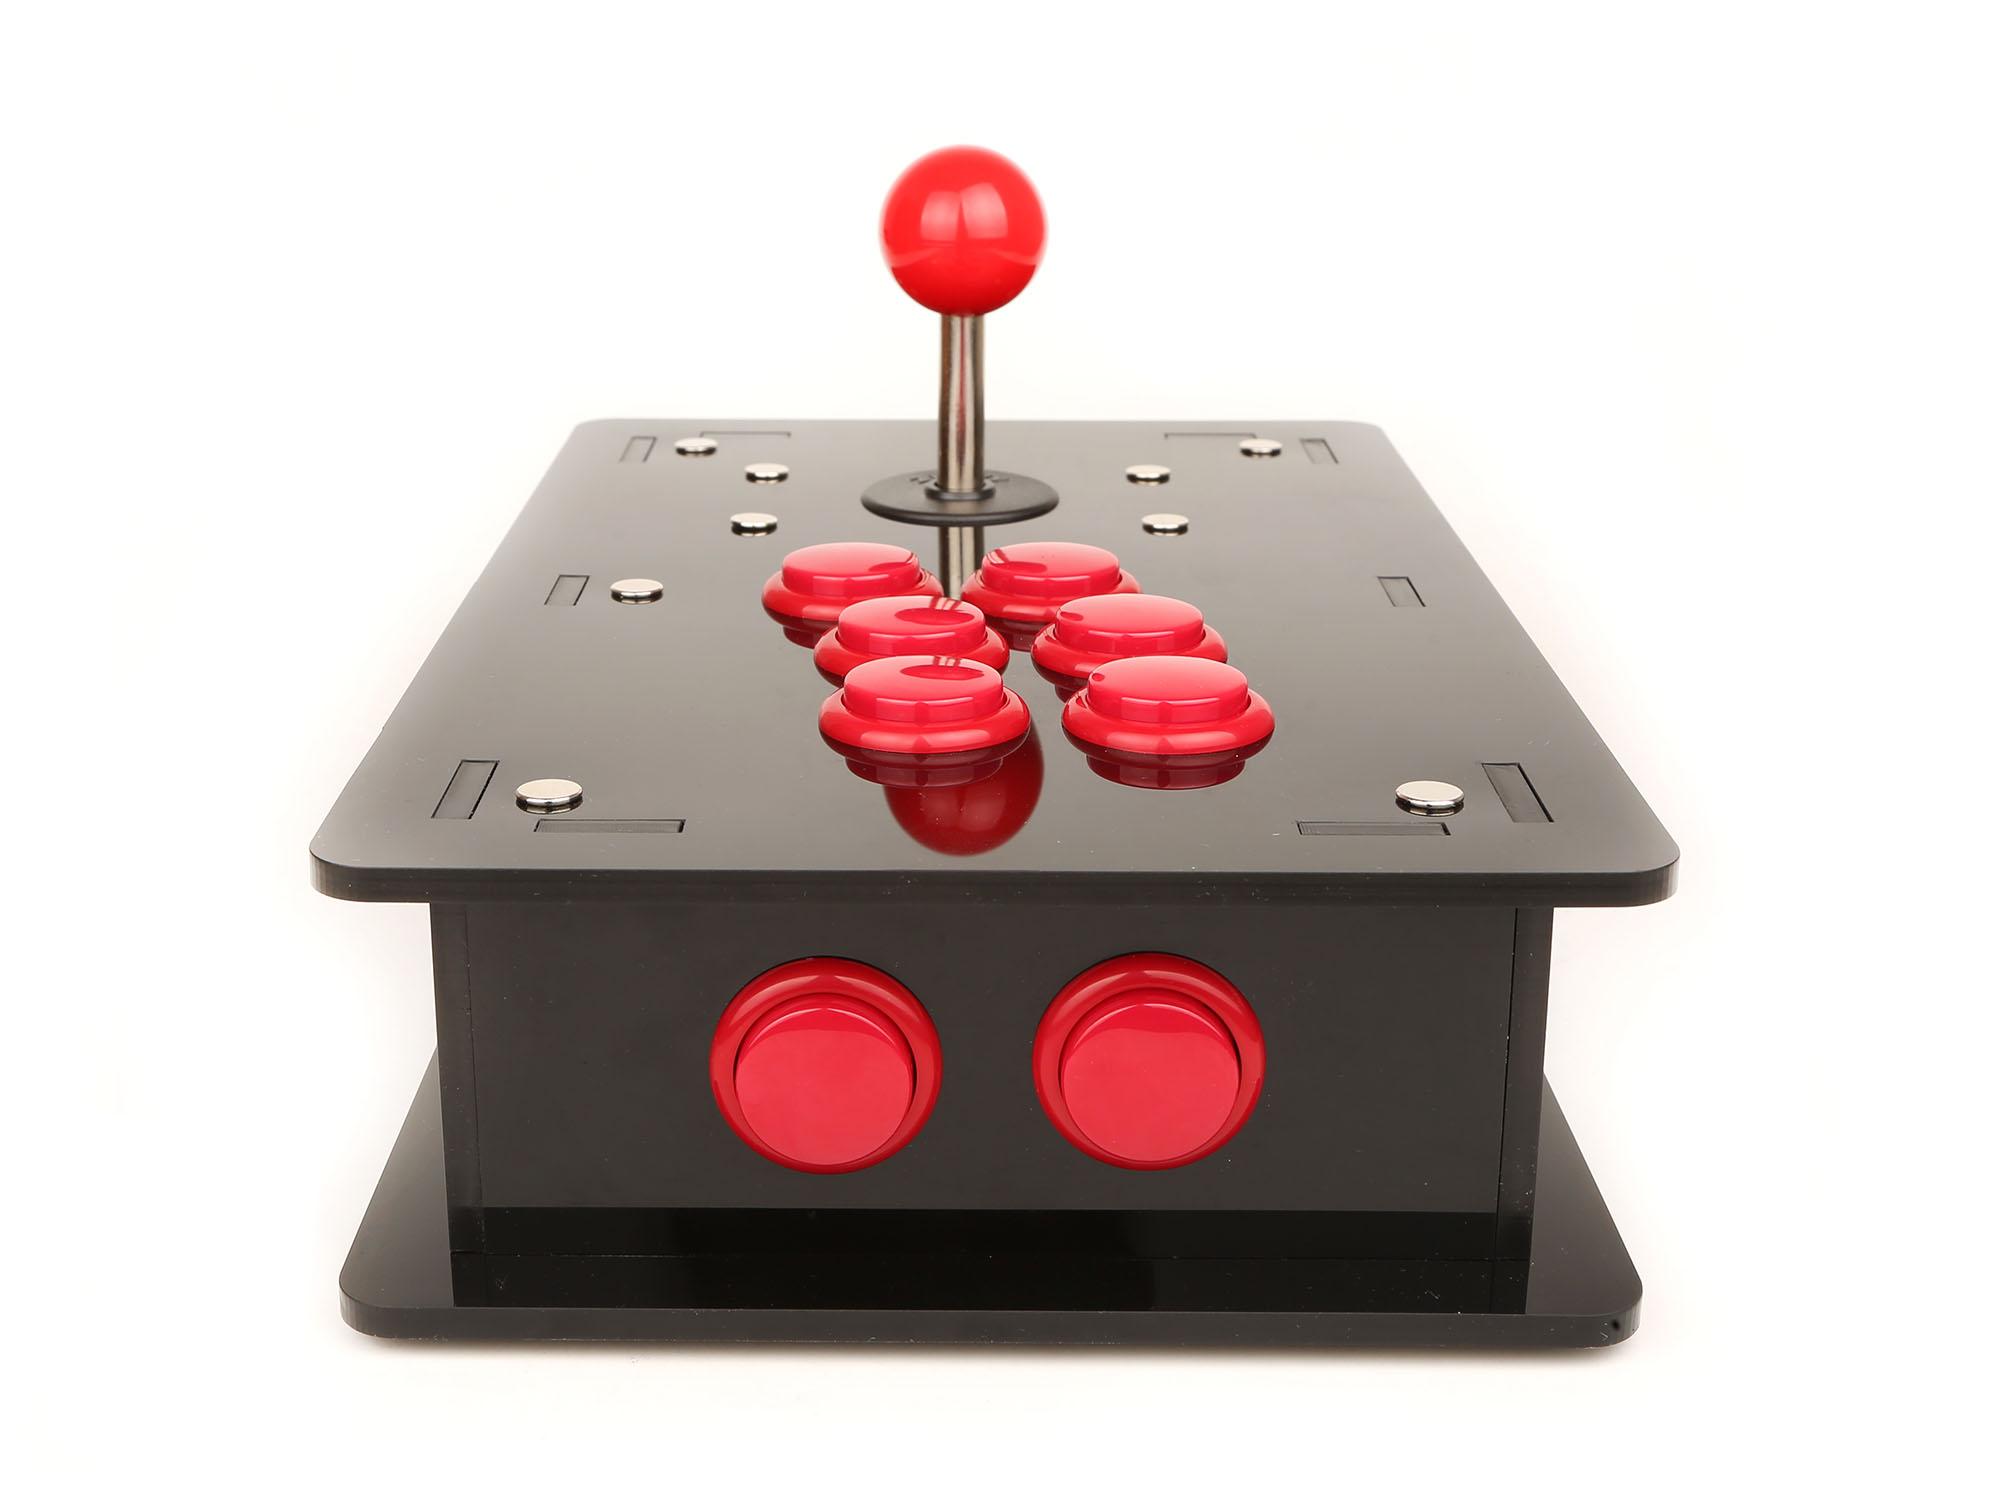 Raspberry Pi Acrylic DIY Retro Game Arcade Kit